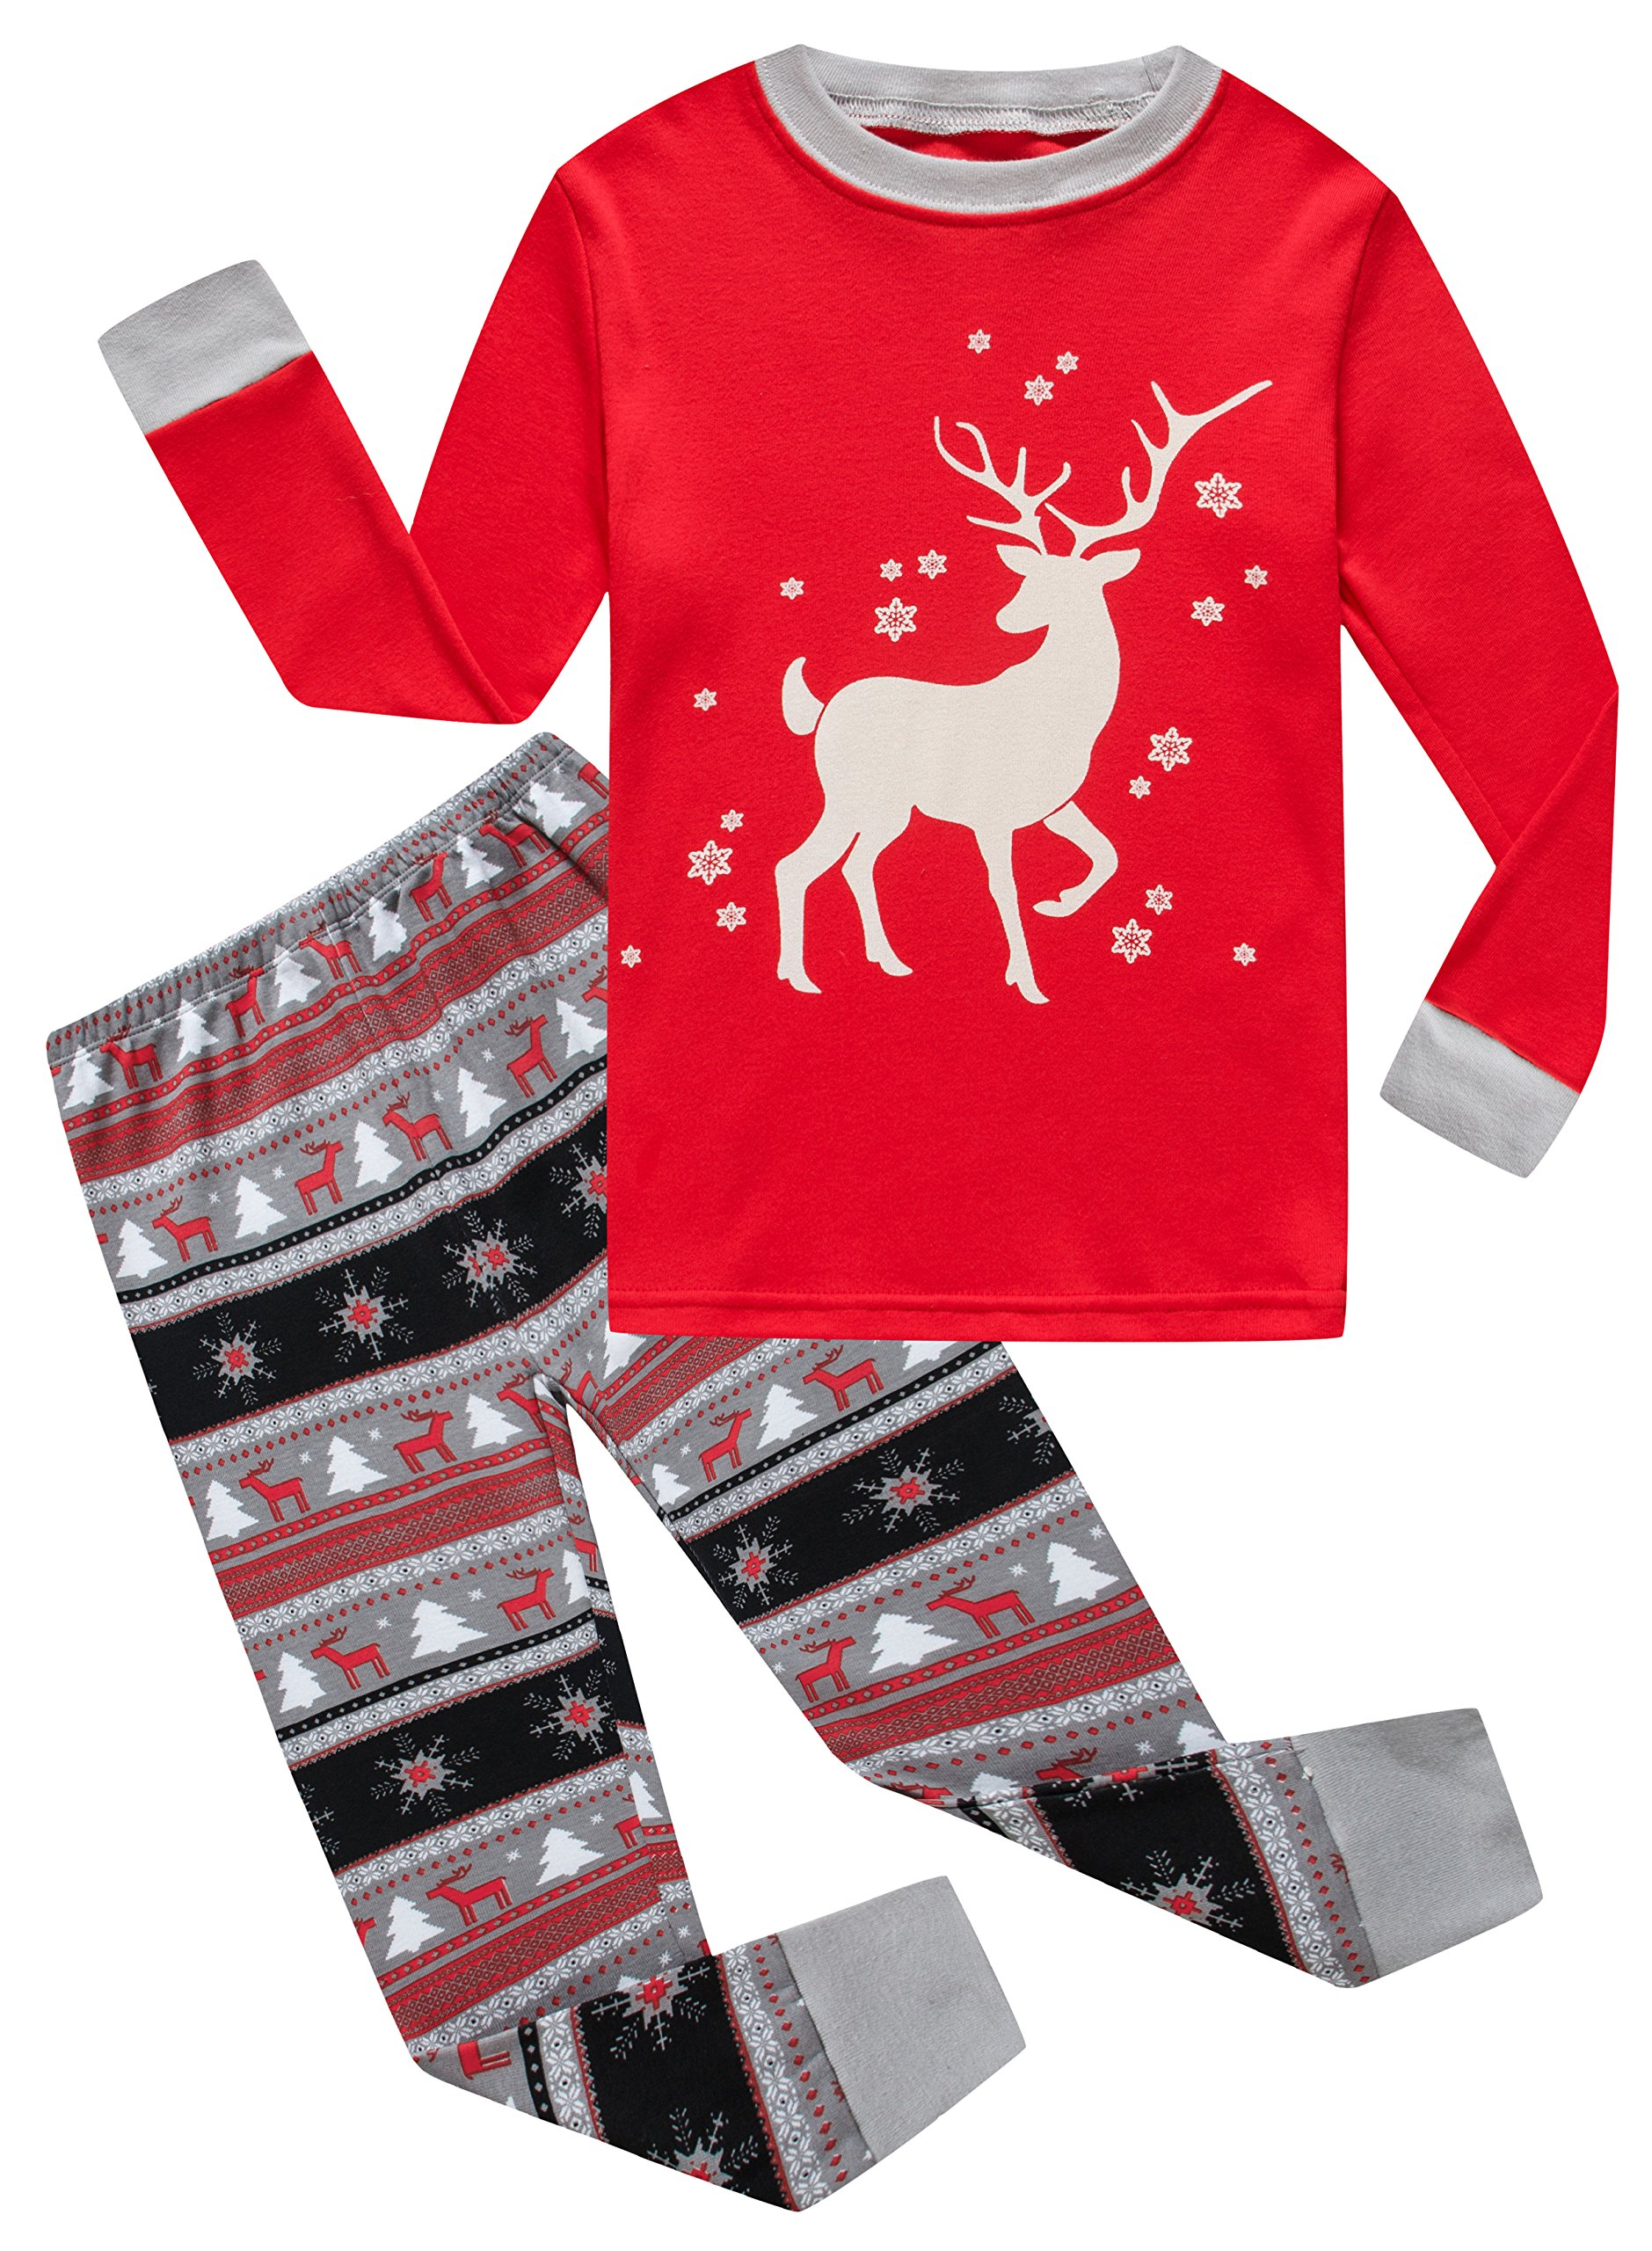 Family Feeling Little Girls Long Sleeve Christmas Pajamas Sets 100% Cotton Pyjamas Toddler Kids Pjs Size 4T Reindeer